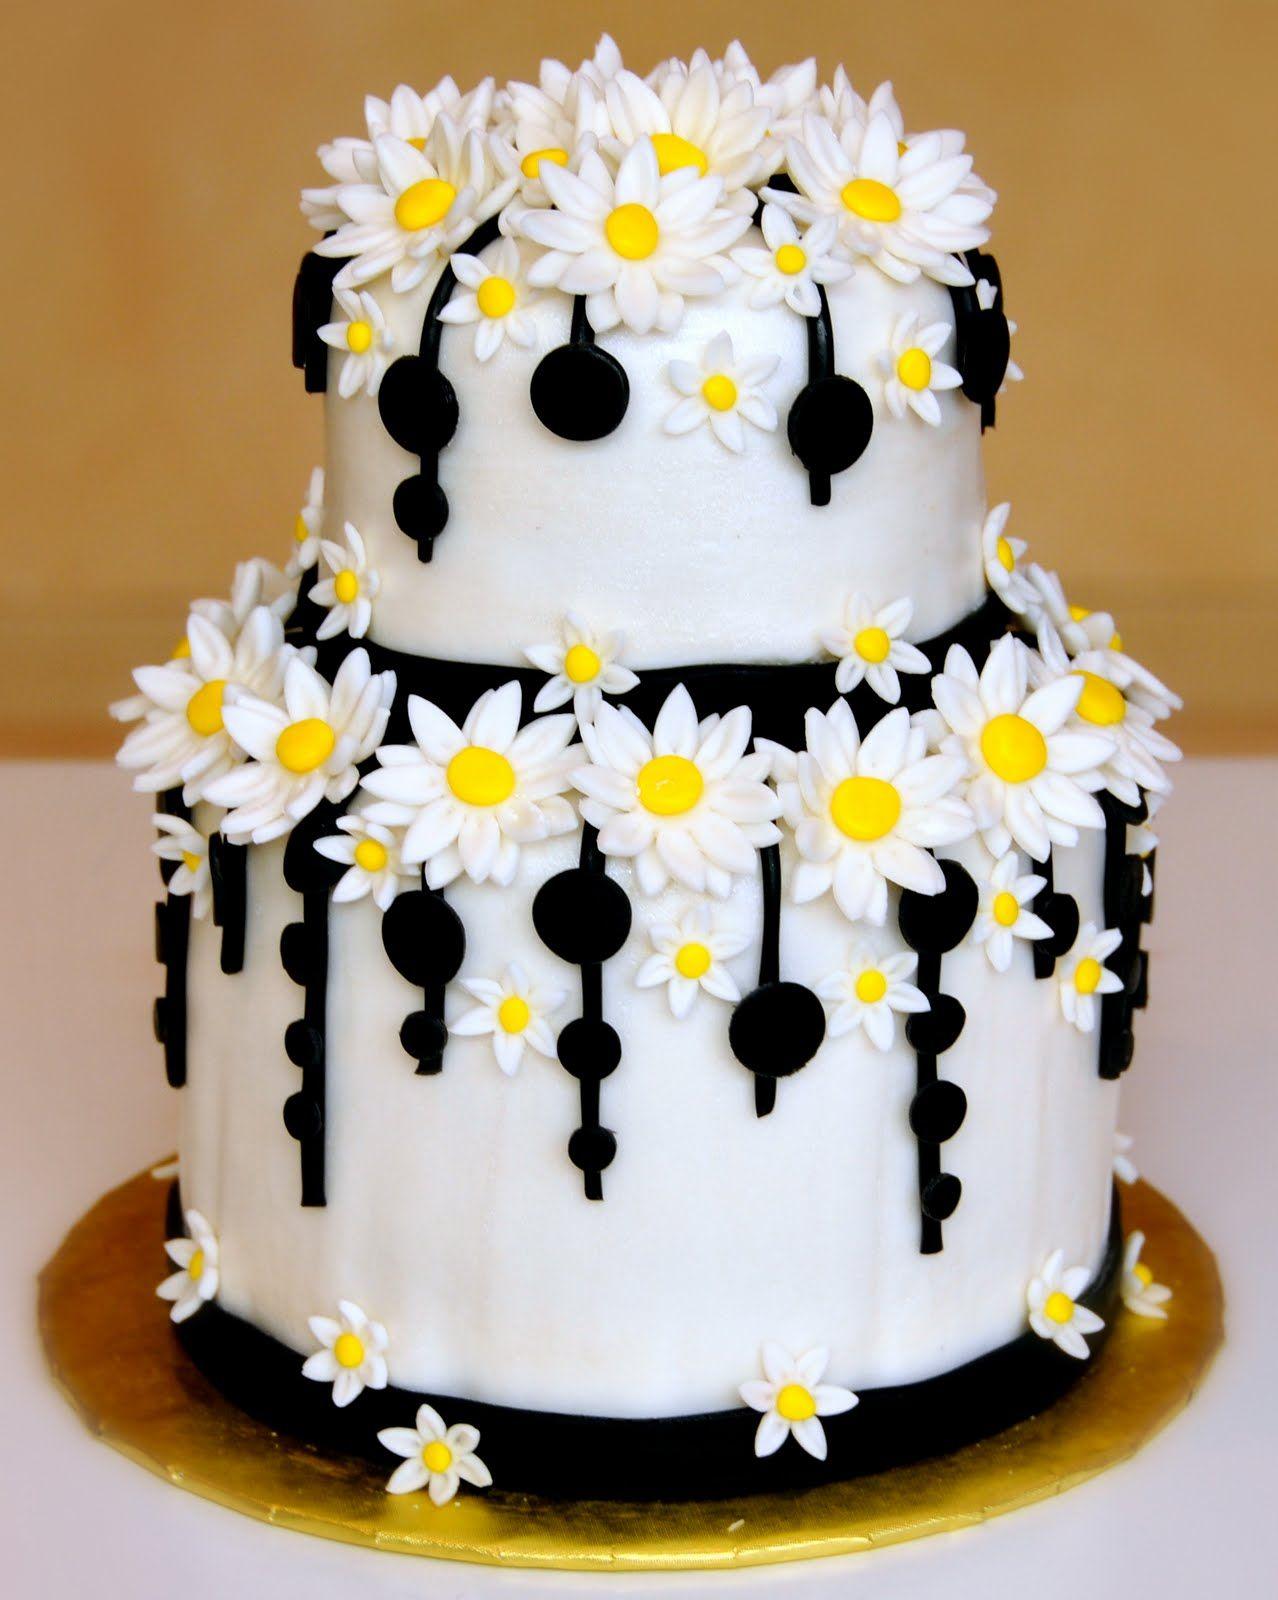 Brilliant Happy Birthday Joann Cake Happy Birthday Joann Birthday Cake Funny Birthday Cards Online Alyptdamsfinfo